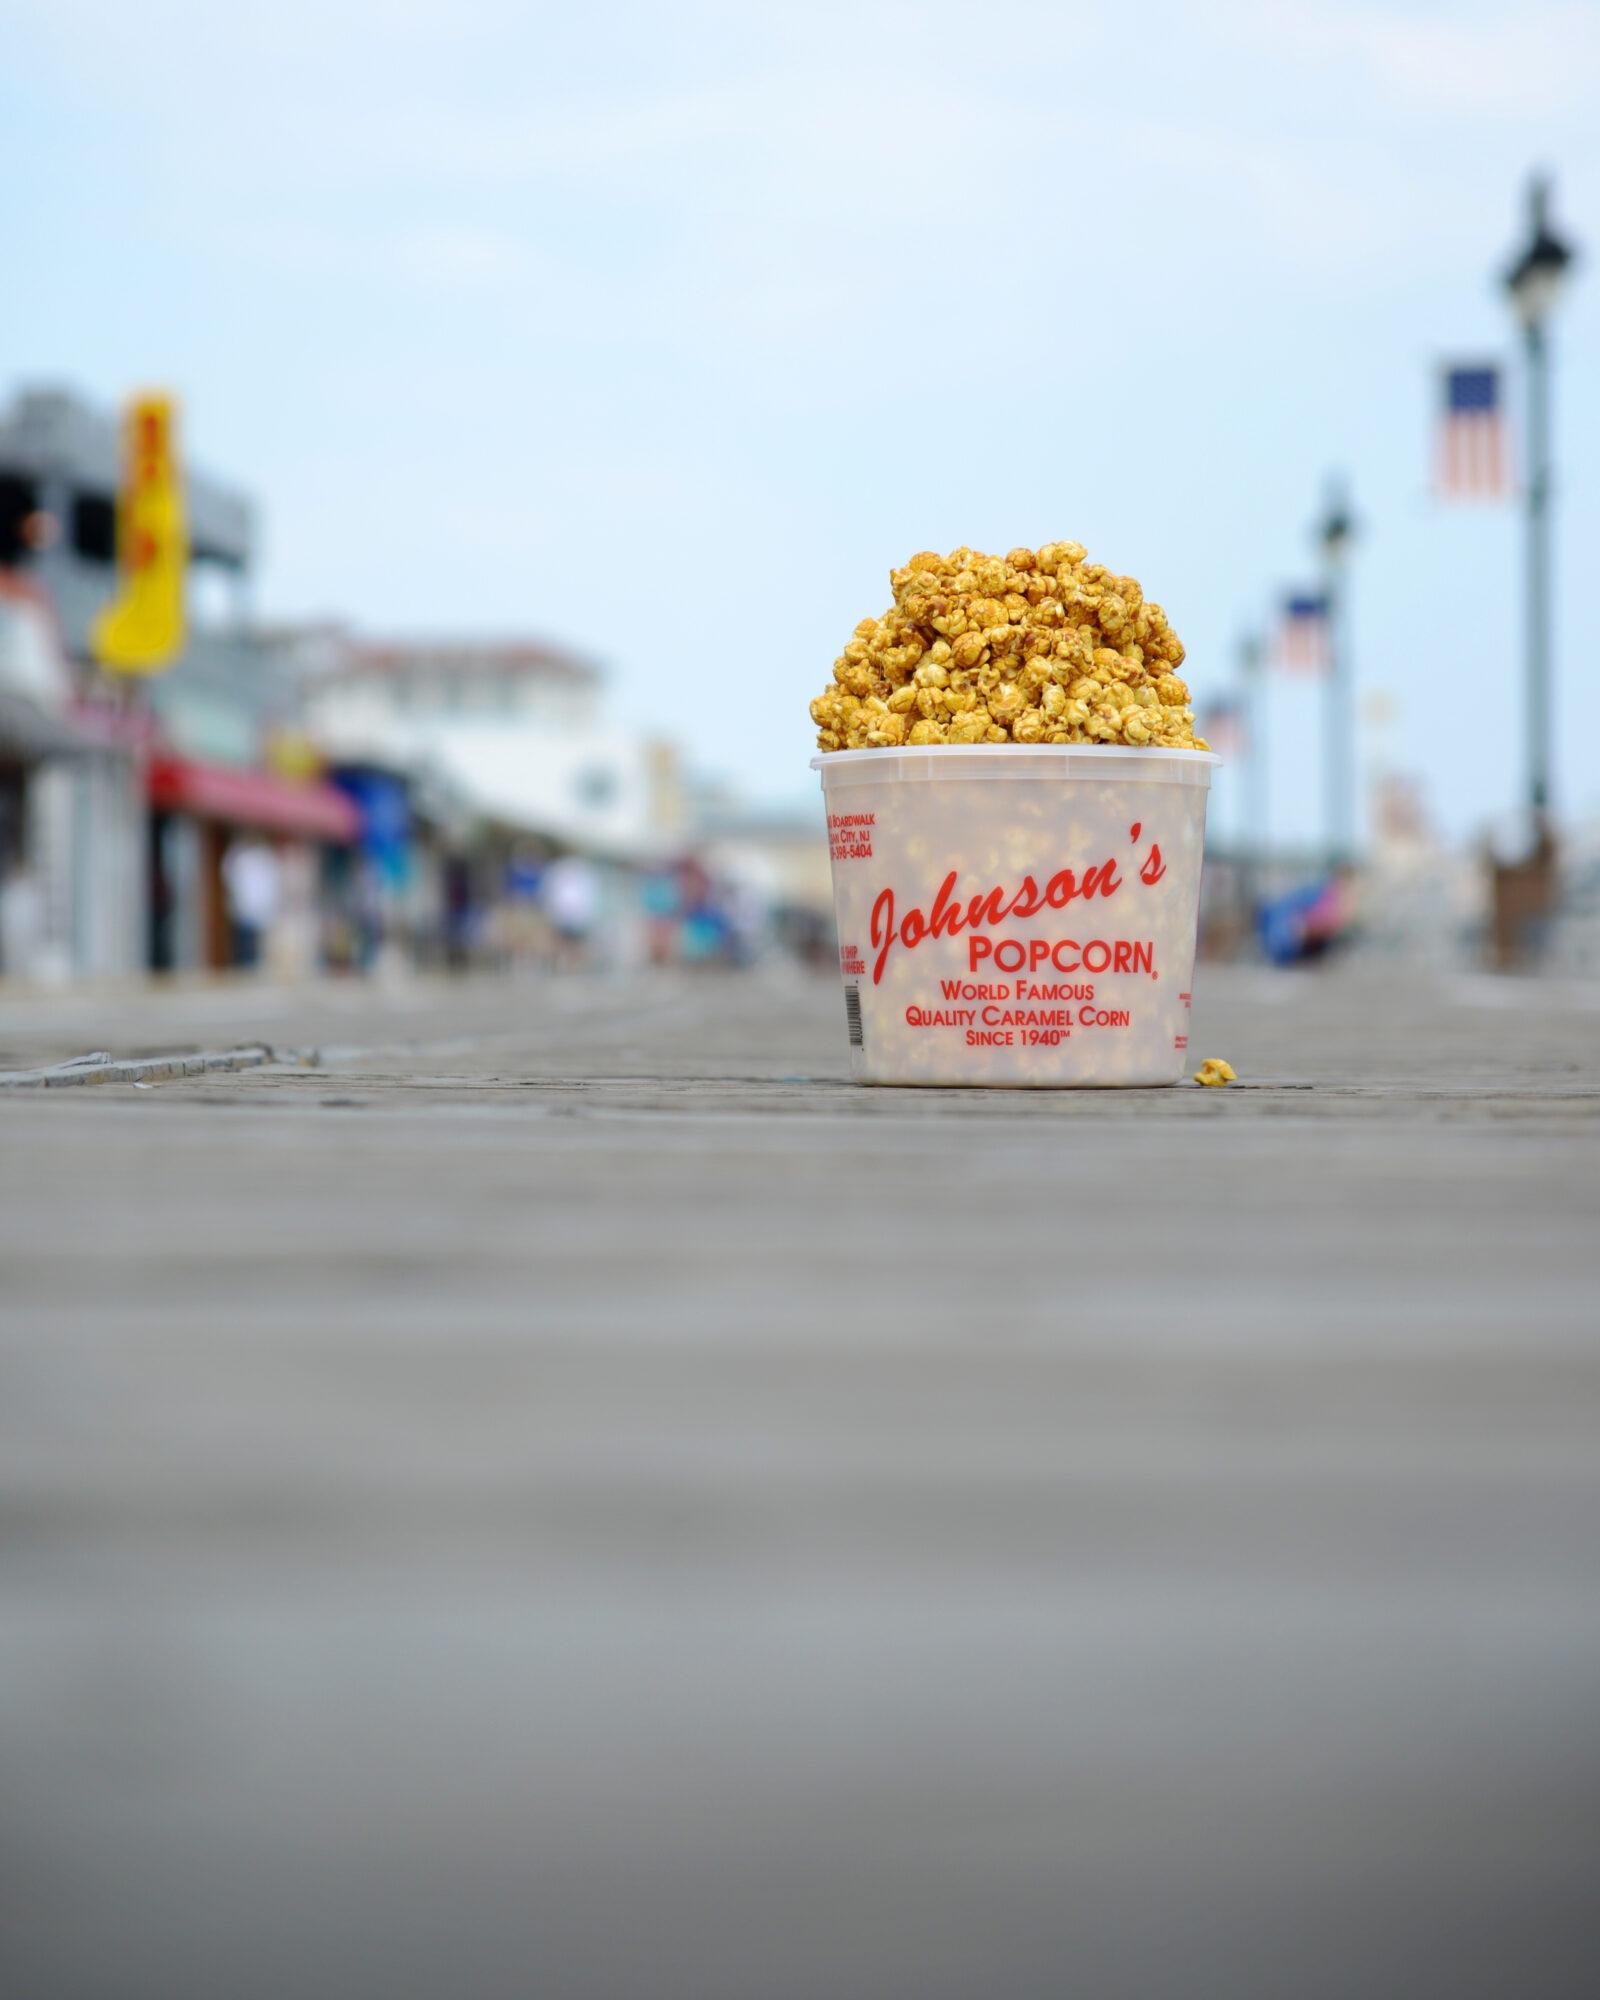 Johnson's Popcorn